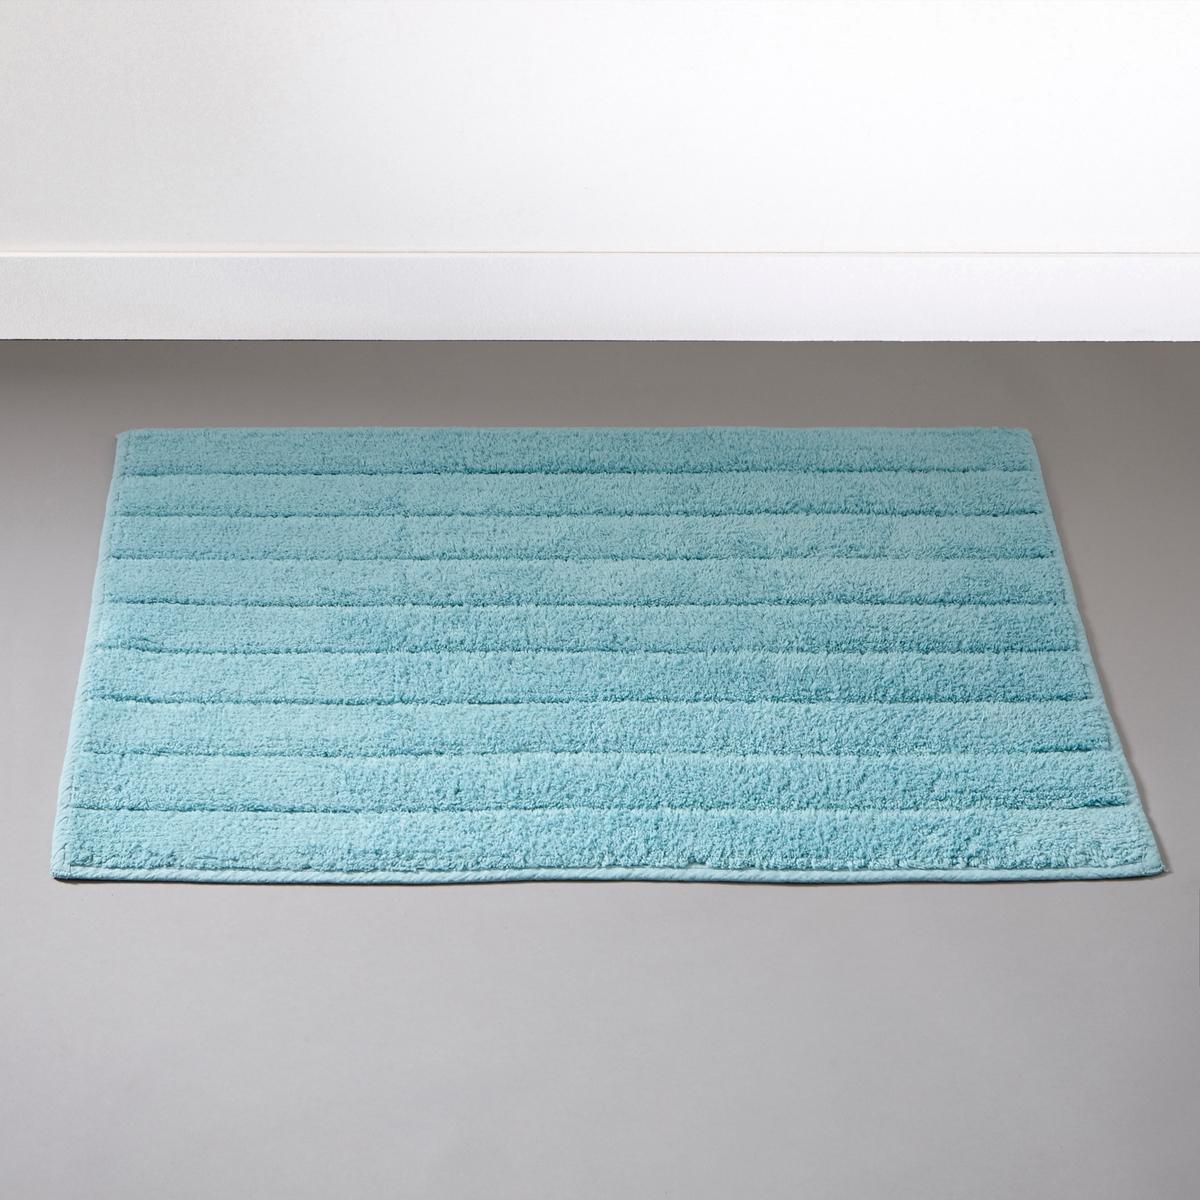 Коврик La Redoute Для ванной гм 50 x 70 см синий коврик для ванной ridder dune двухсторонний цвет синий голубой 70 х 120 см